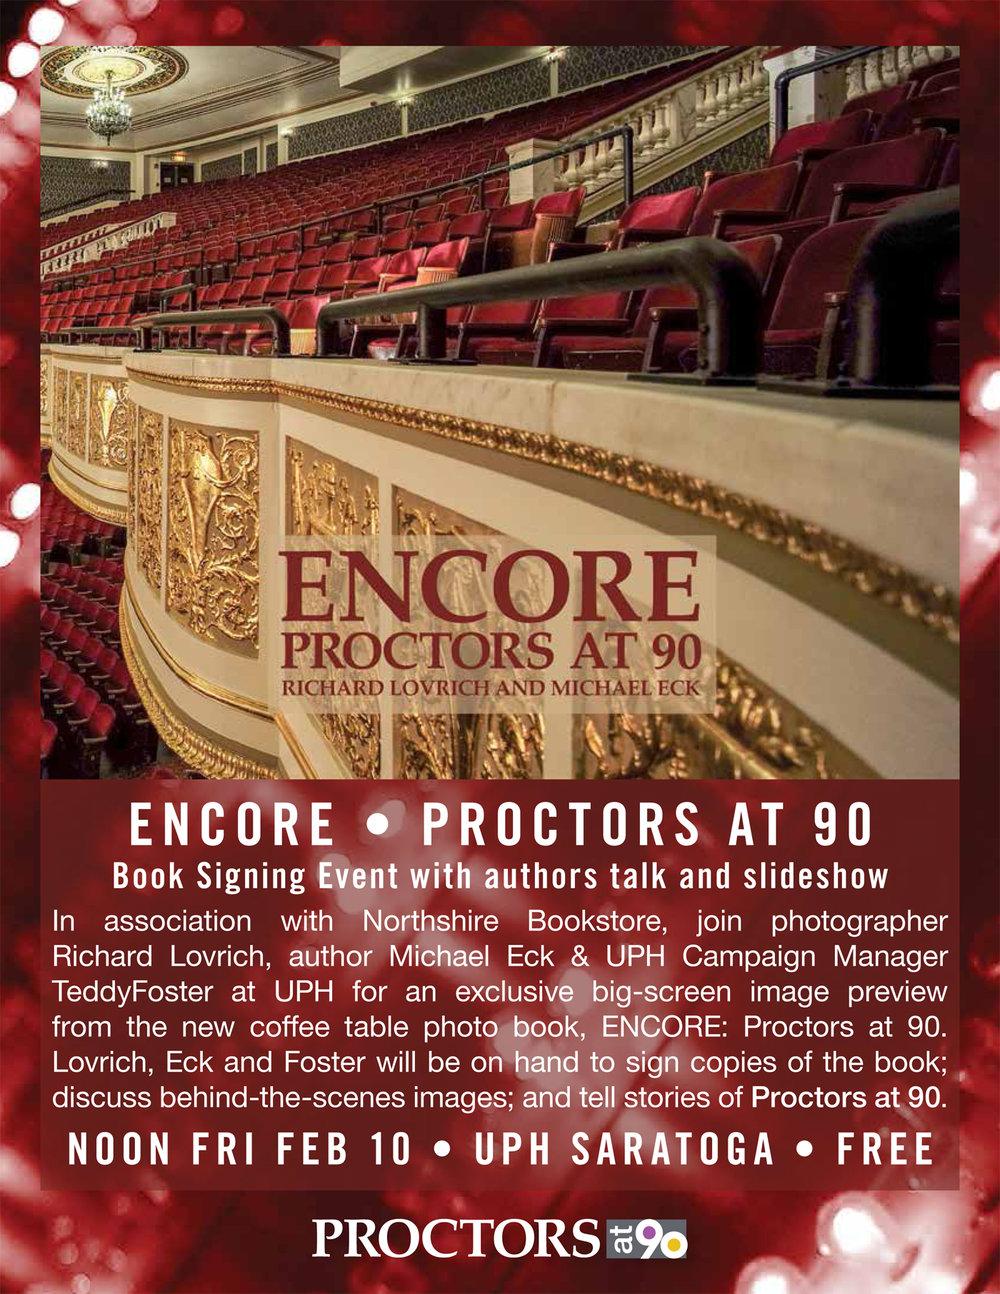 ENCORE_poster-8x11-UPH-web.jpg